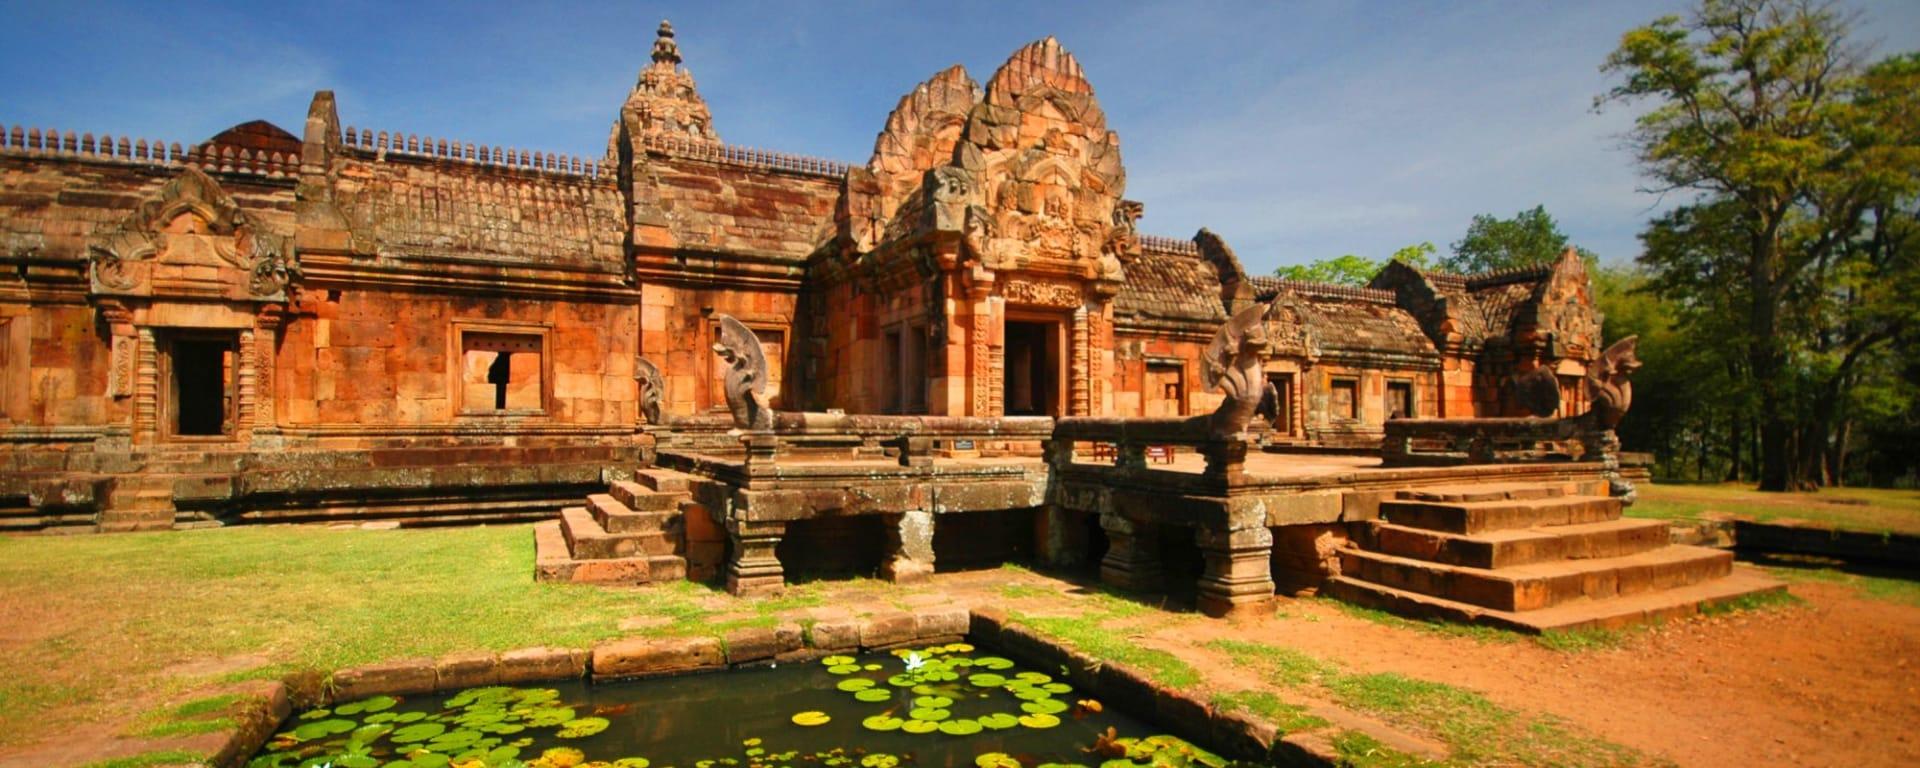 Unbekannter I-San ab Bangkok: Phanom rung national park in North East of Thailand